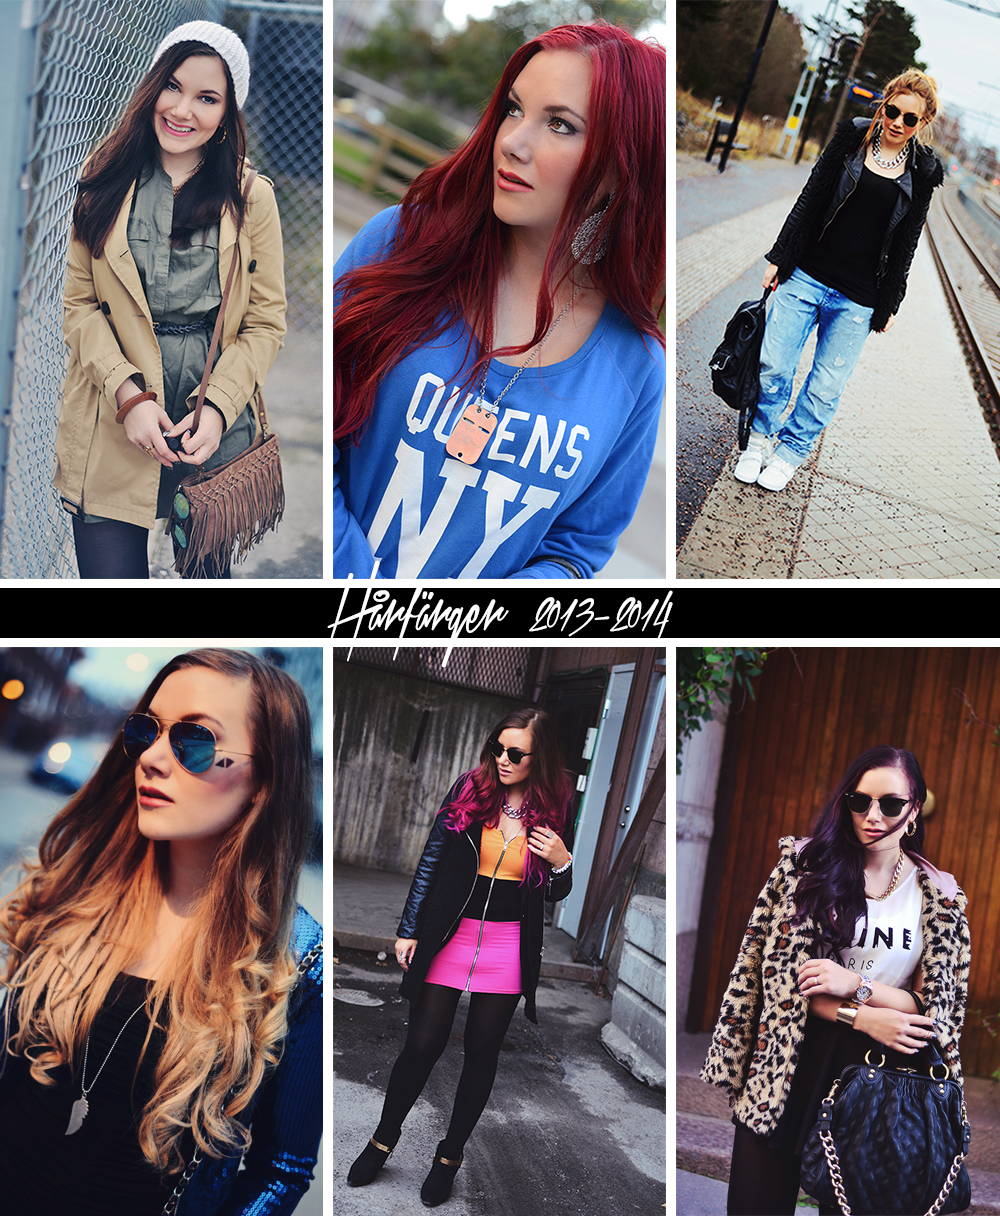 Adaras hårfärger 2013-2014